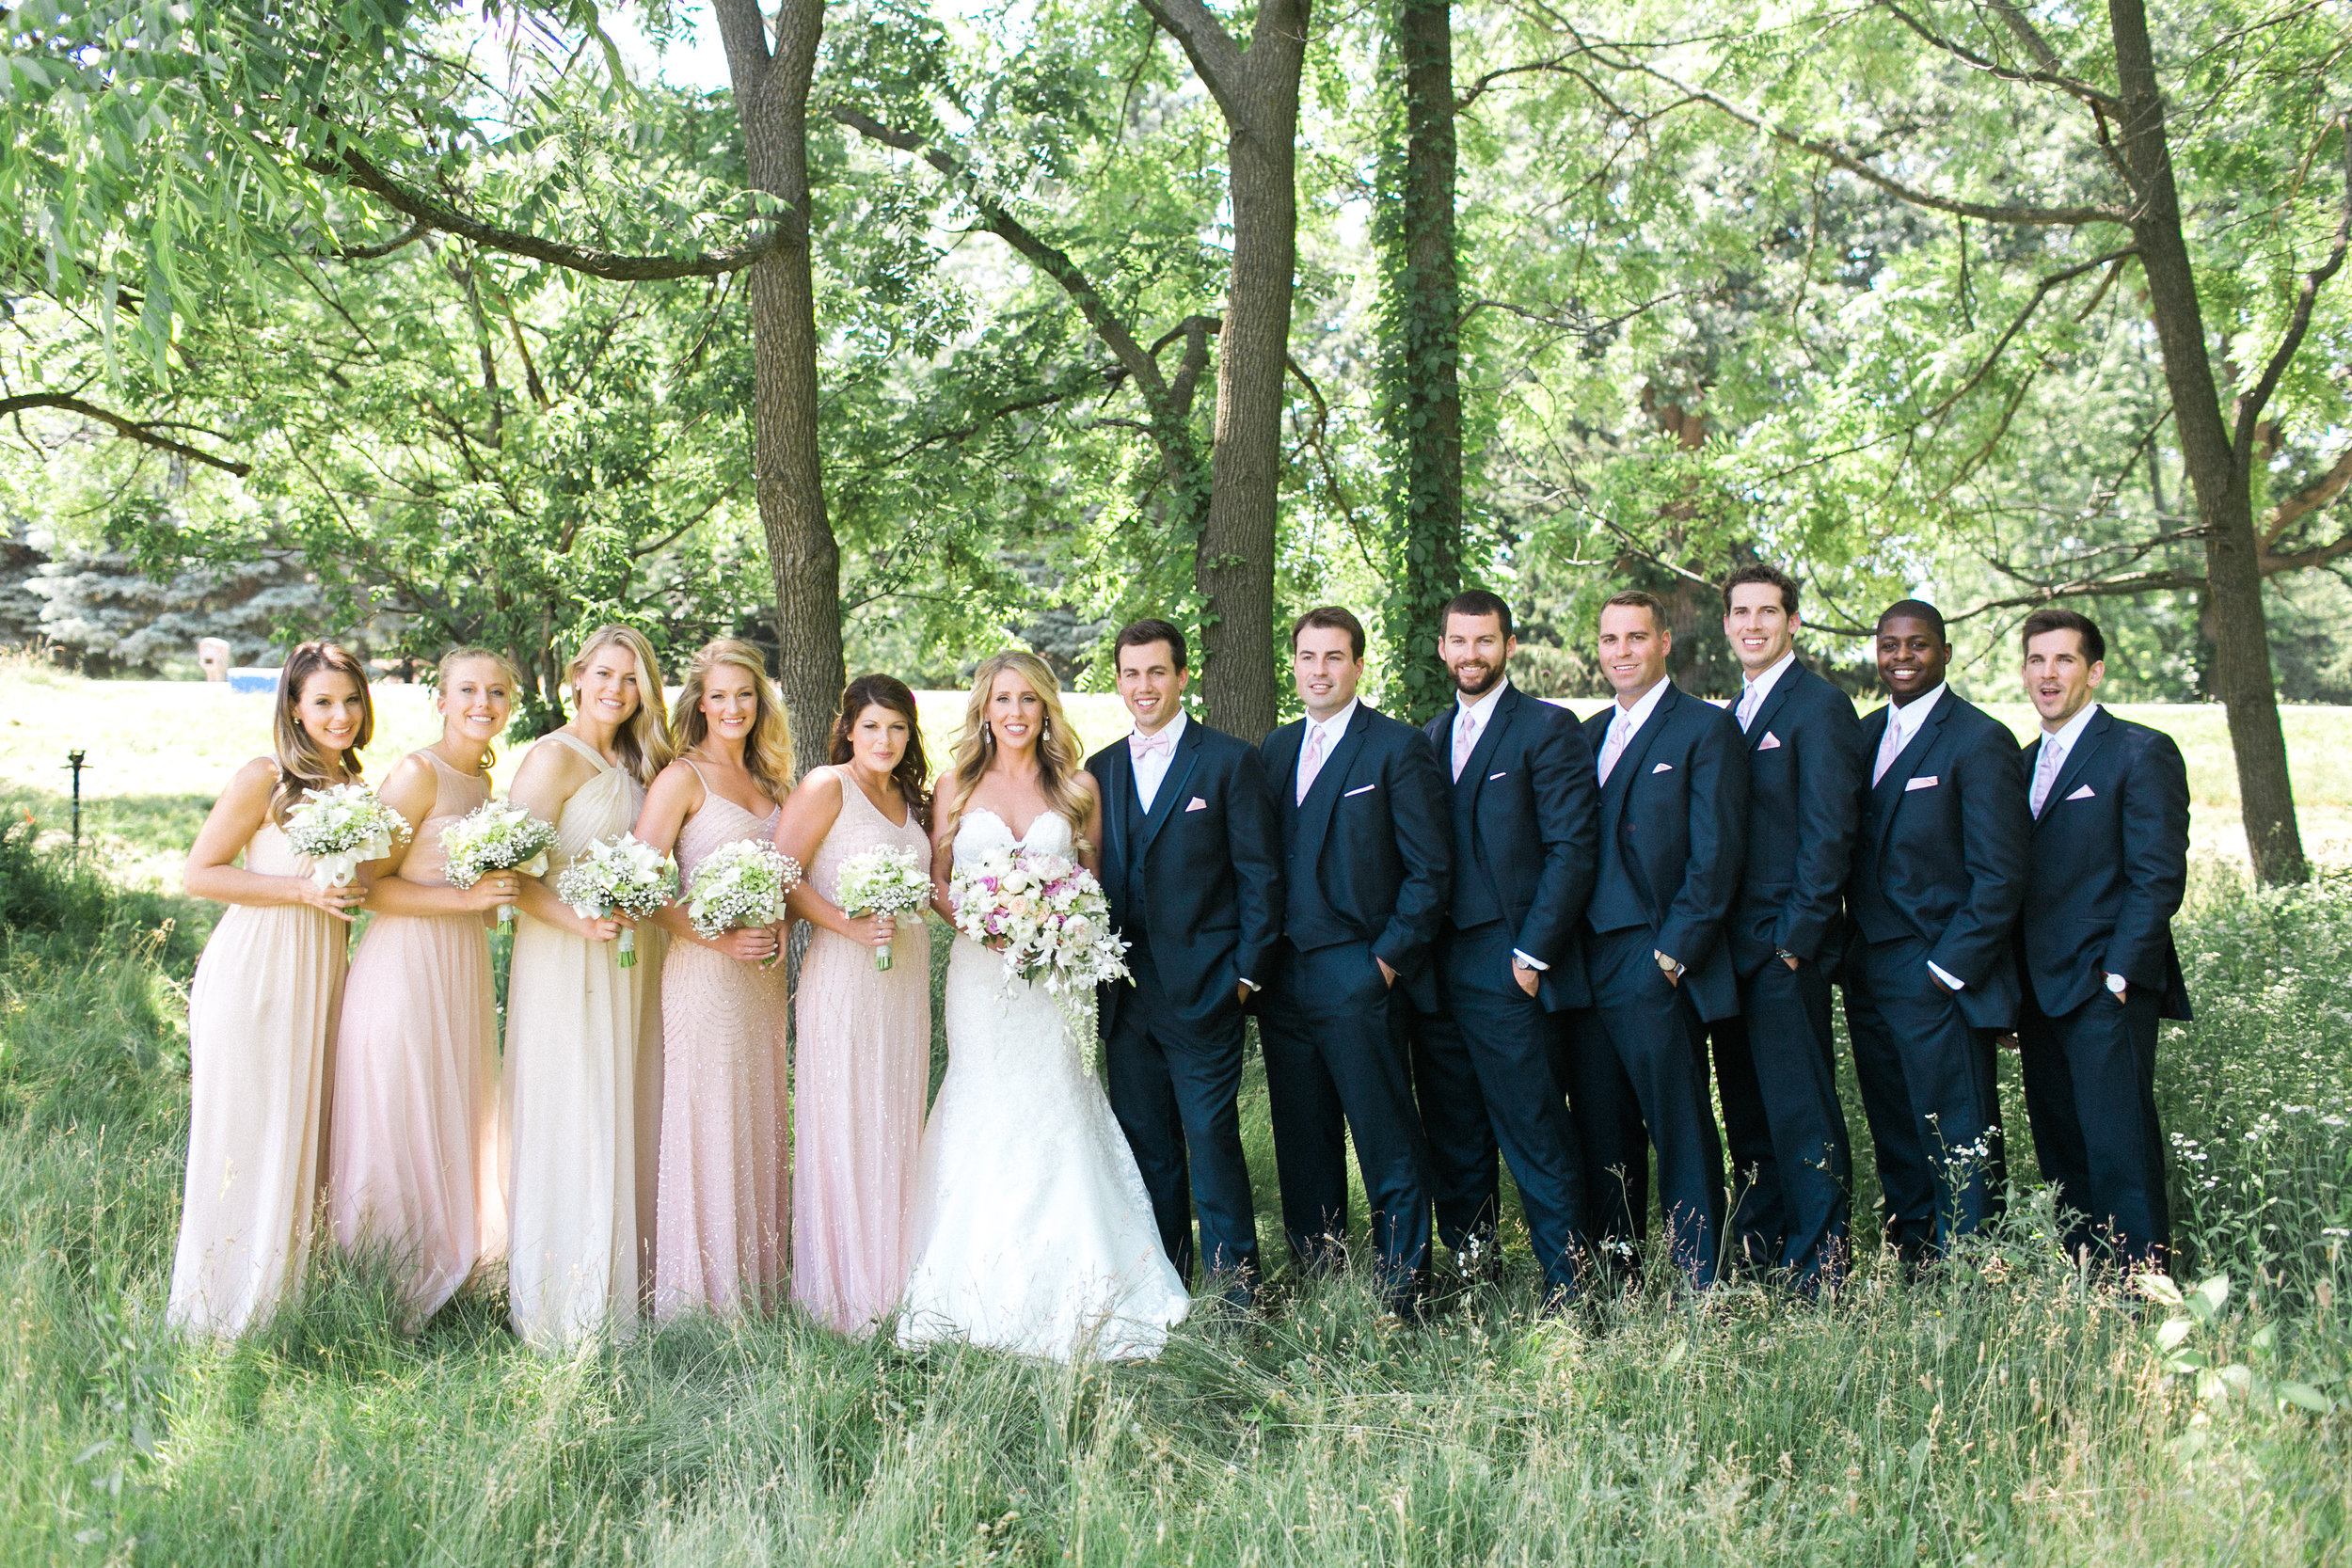 whitney-michael-wedding-132.jpg